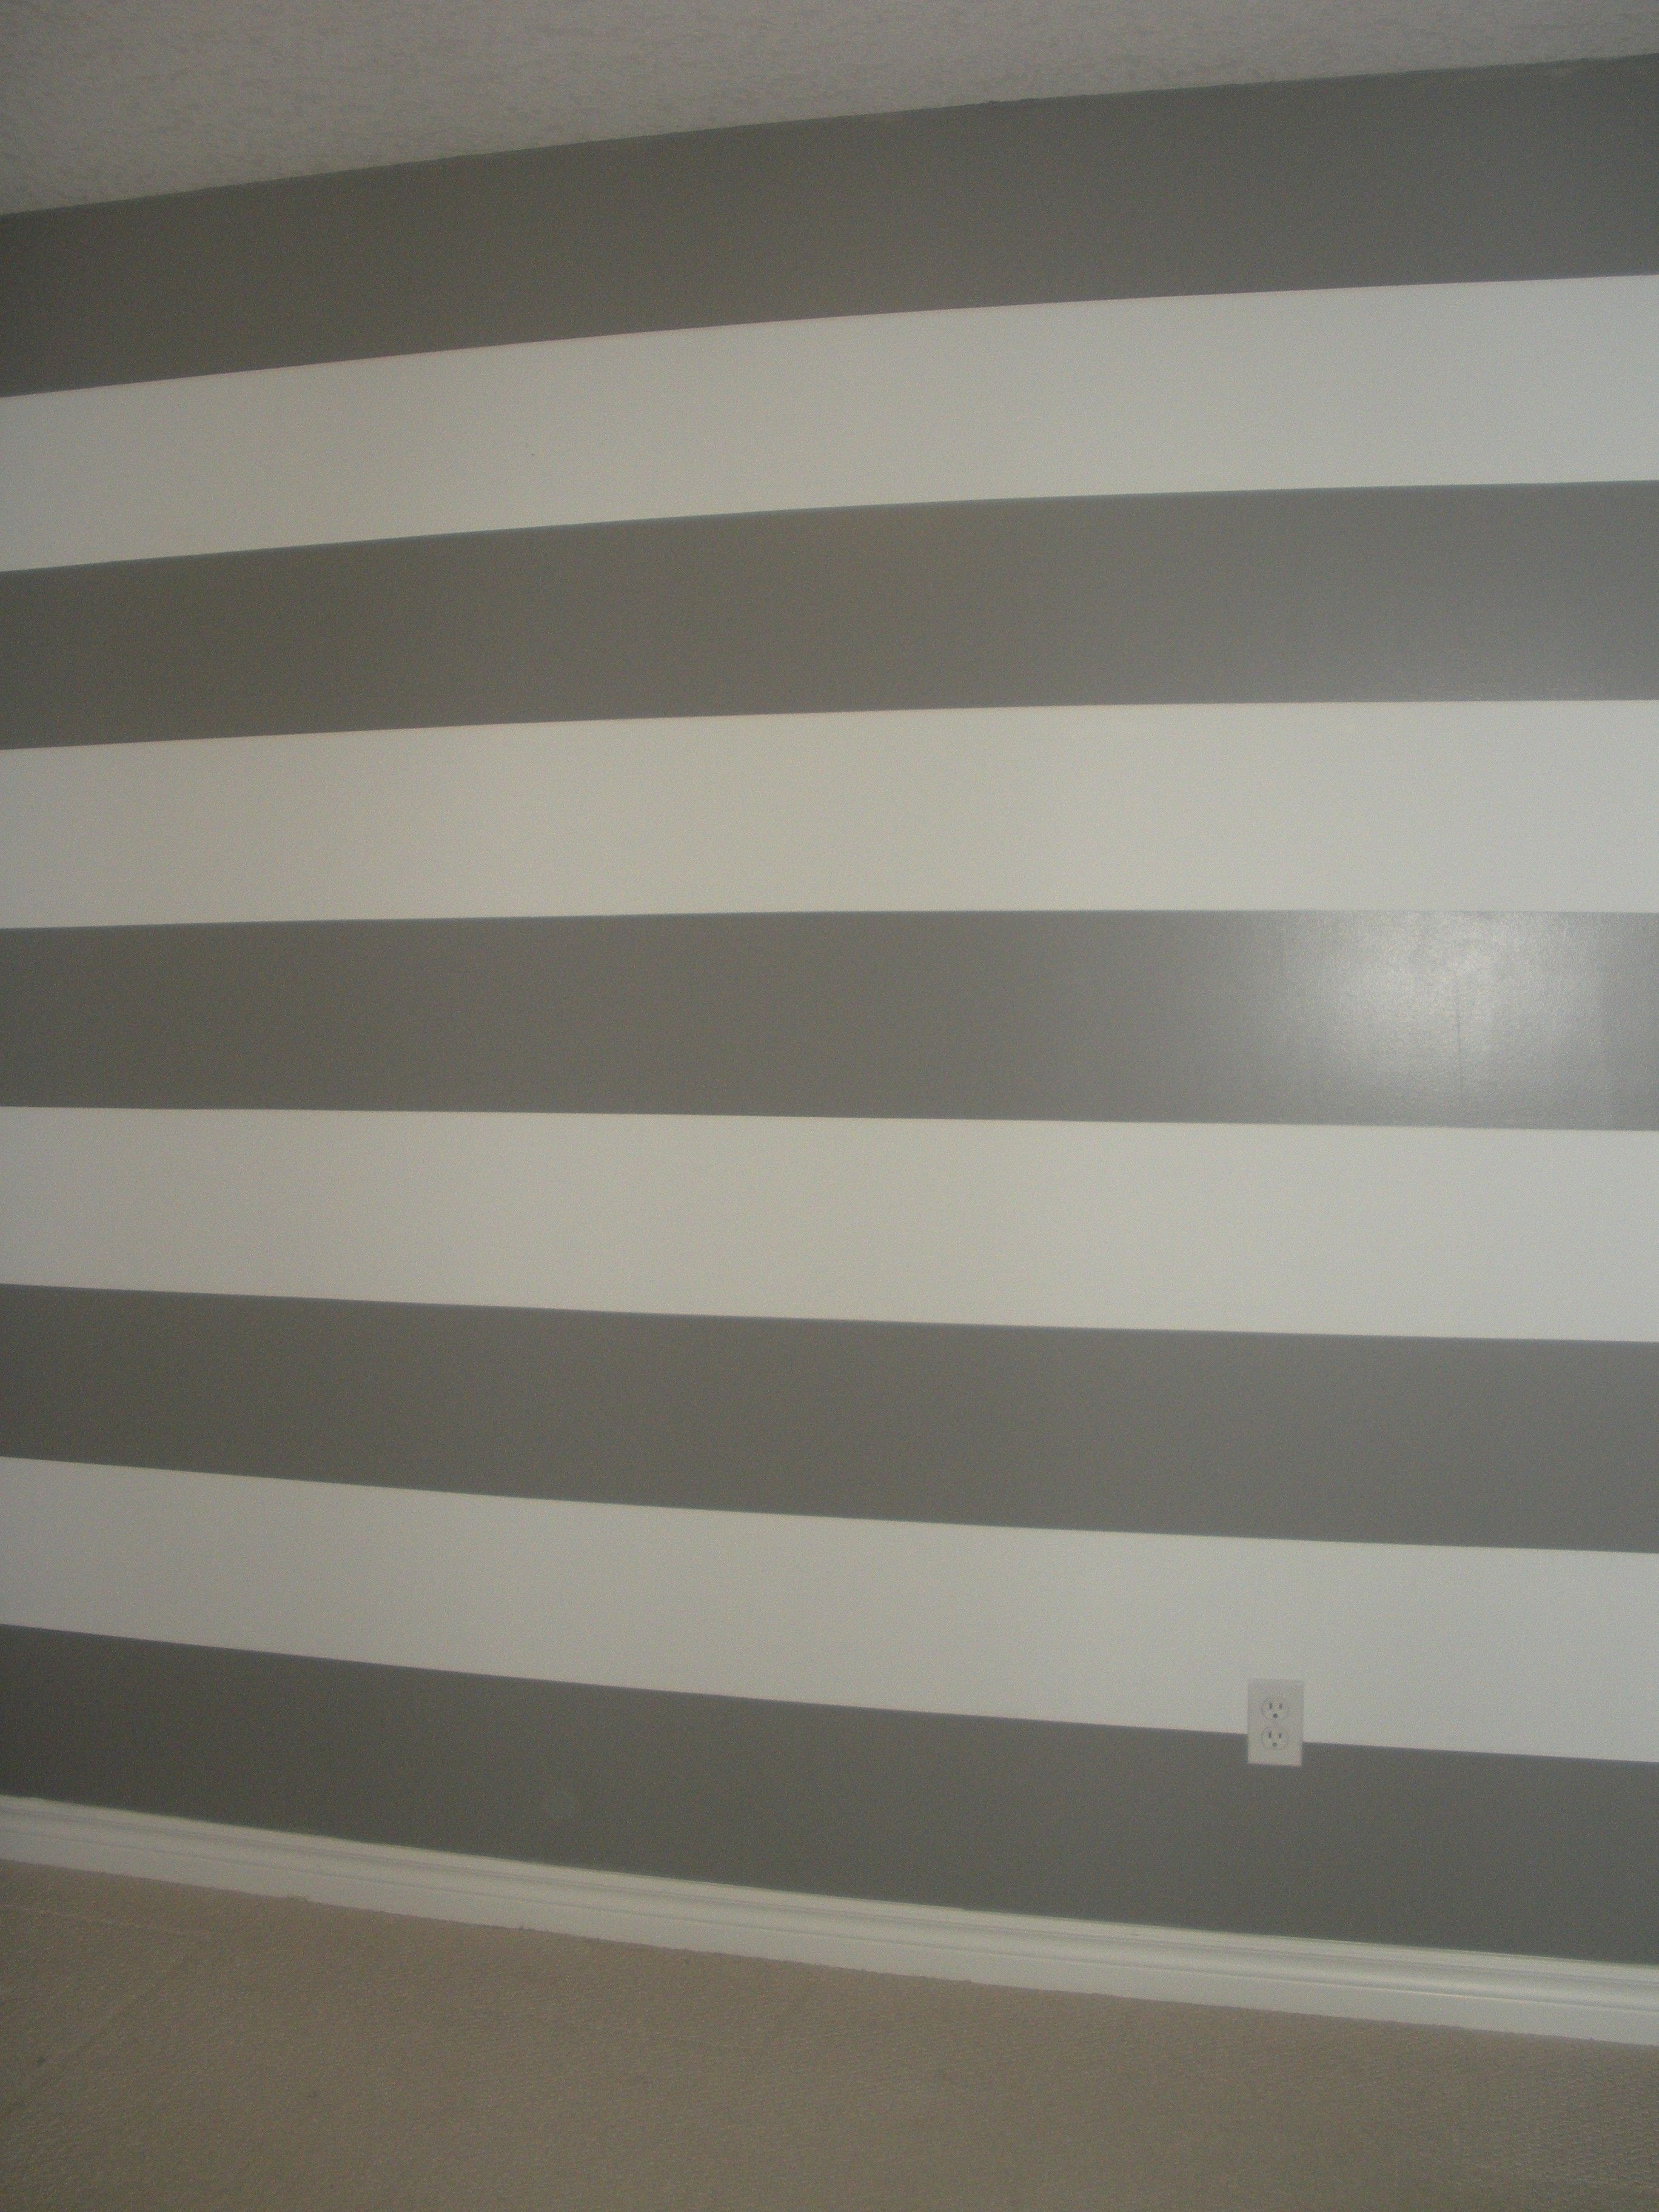 Pin By Sarah Thomas On Baby Boy S Nursery Striped Bathroom Walls